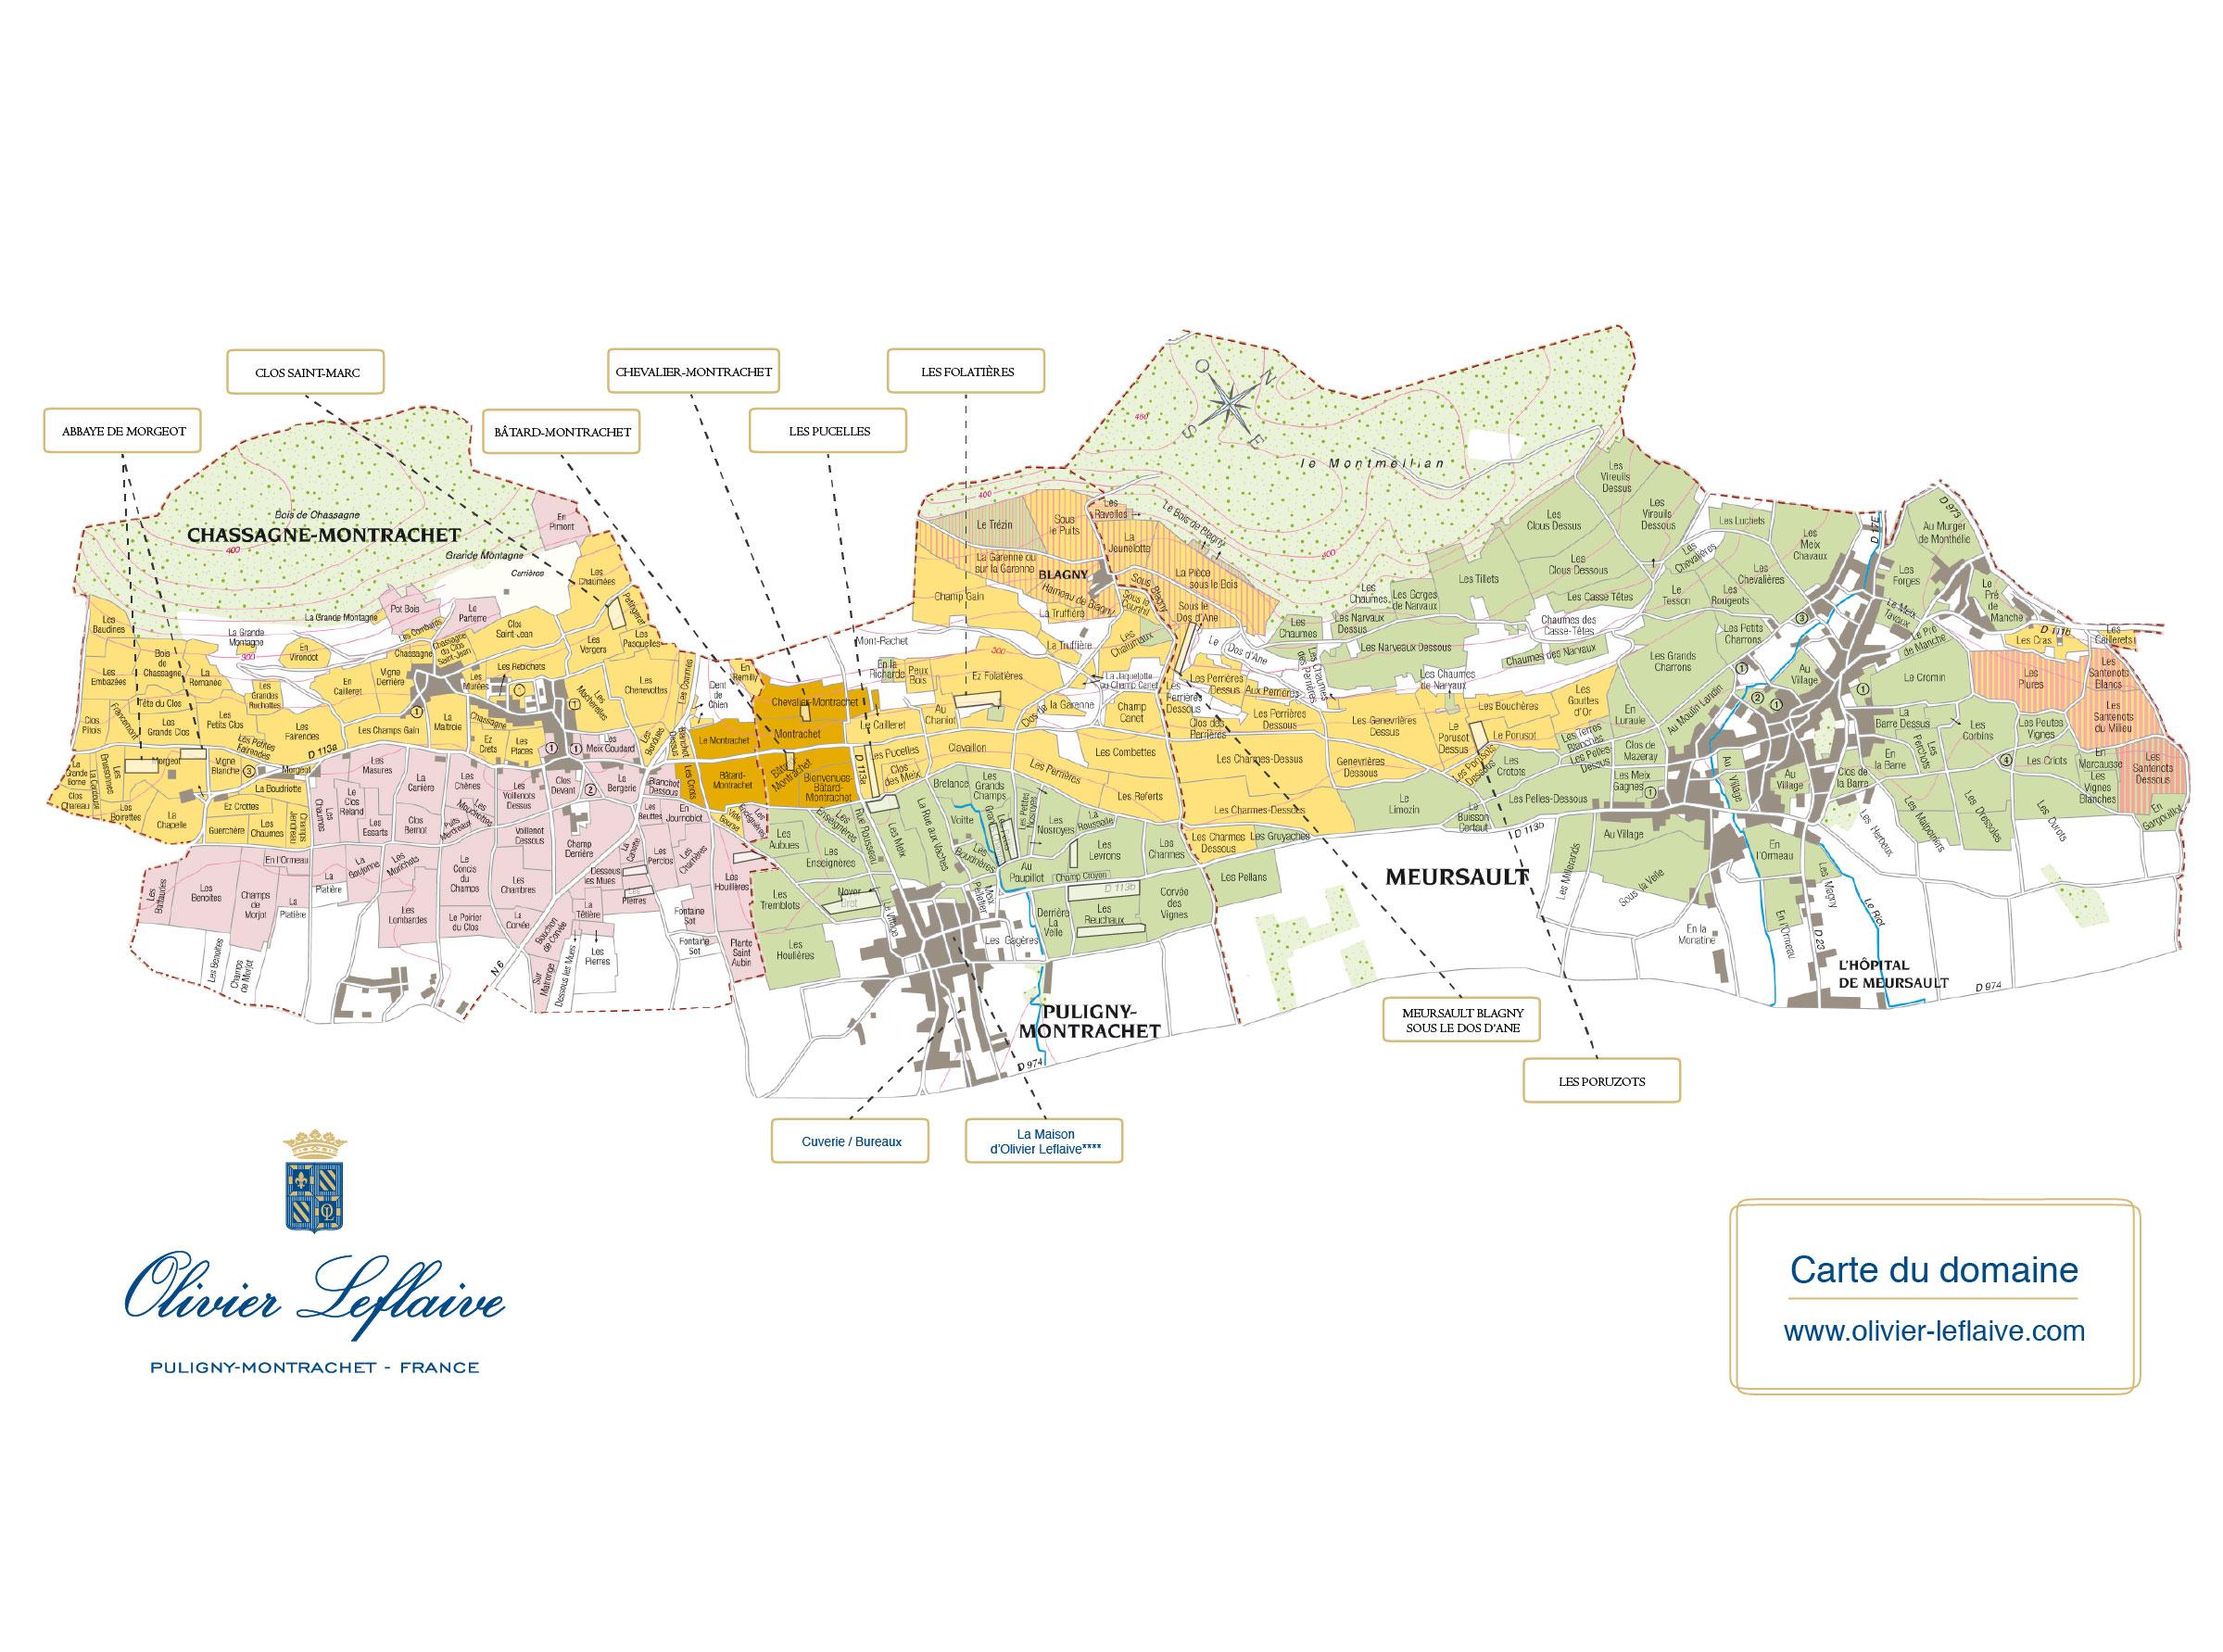 olivier-leflaive-carte-du-domaine